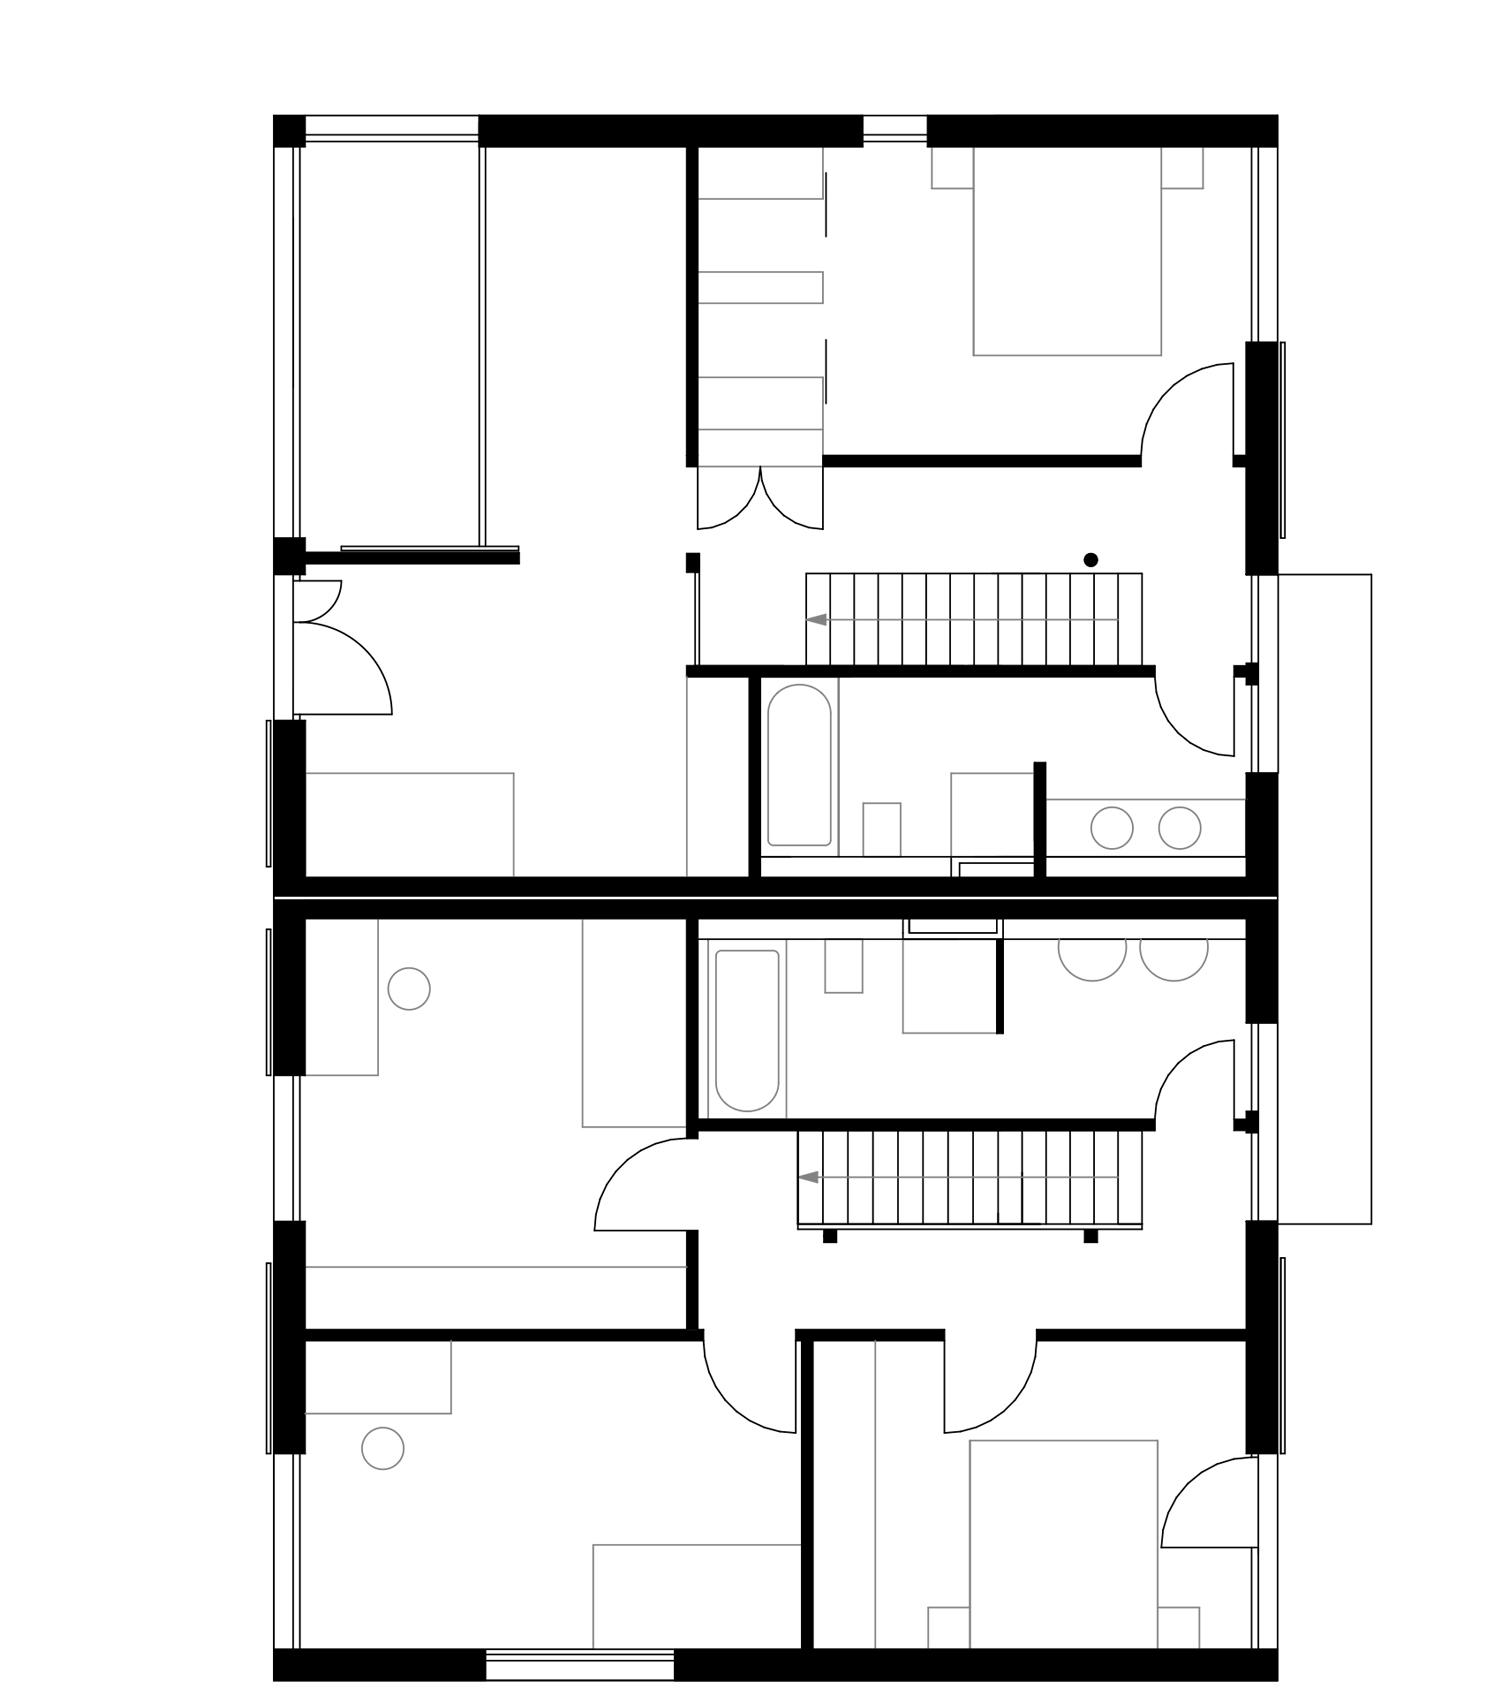 https://www.architectoo.de/images/1030t.jpg